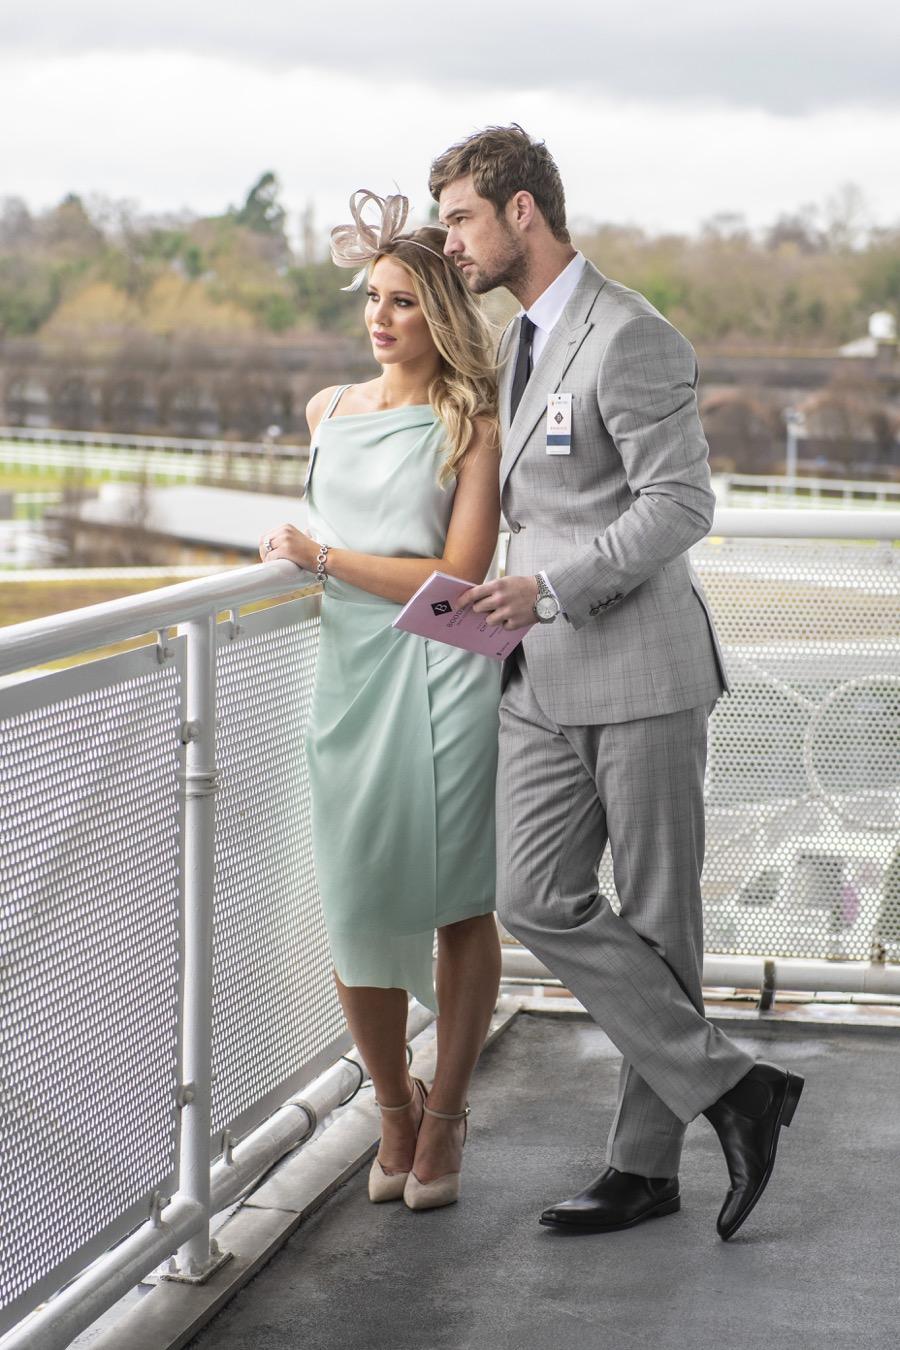 LEFT:  Reiss Dress, £123  (RRP £185);  Reiss Shoes, £95  (RRP £155);  Coast Fascinator, £15  (RRP £45)    RIGHT:  Reiss Suit £245  (RRP £550);  Reiss Shirt, £53  (RRP £80);  Armani Tie, £39  (RRP £59);  Reiss Boots, £130  (RRP £195);  Armani Watch, £161  (RRP £249)